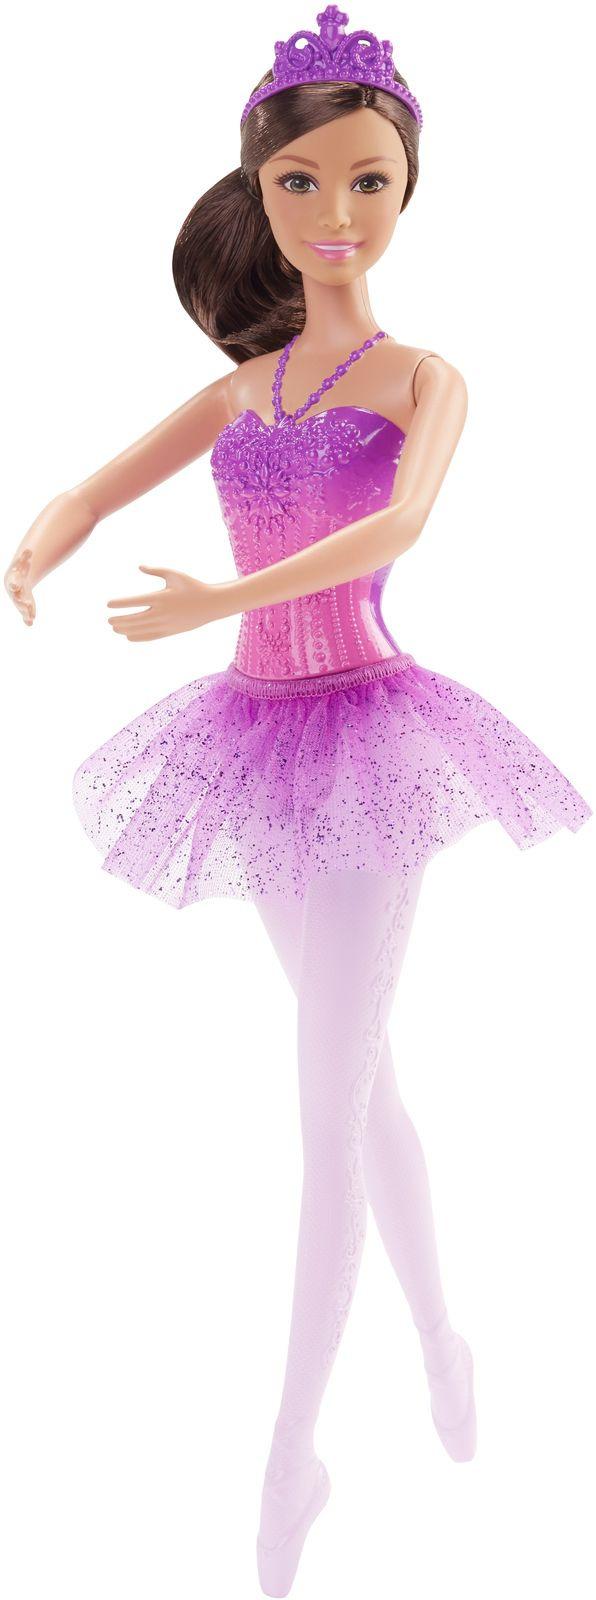 Barbie Кукла Балерина цвет юбки фиолетовый